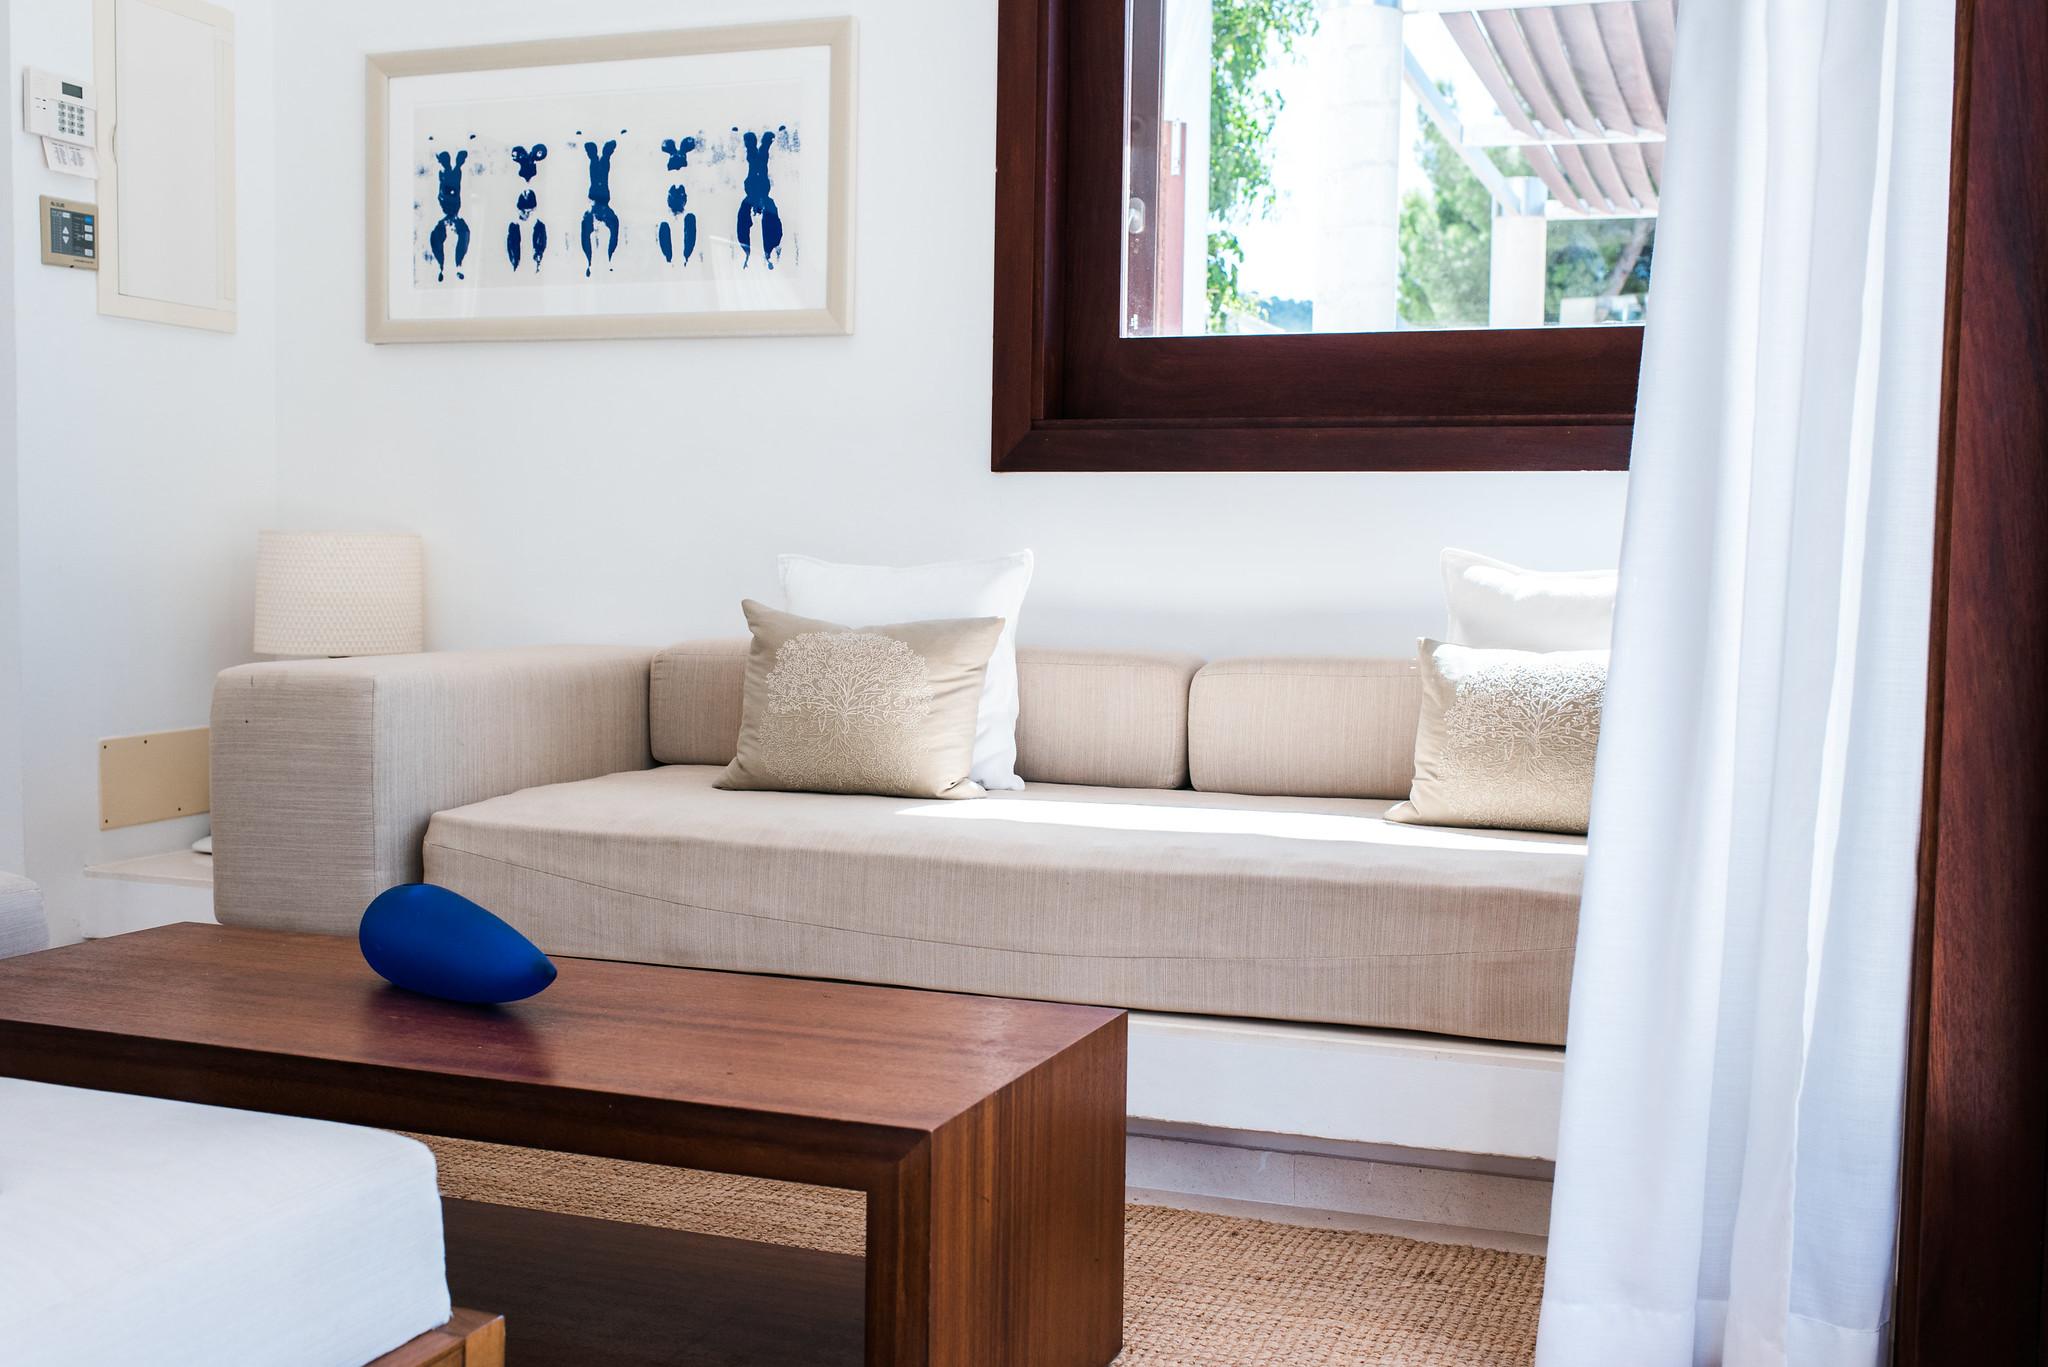 https://www.white-ibiza.com/wp-content/uploads/2020/05/white-ibiza-villas-can-ava-tv-room.jpg